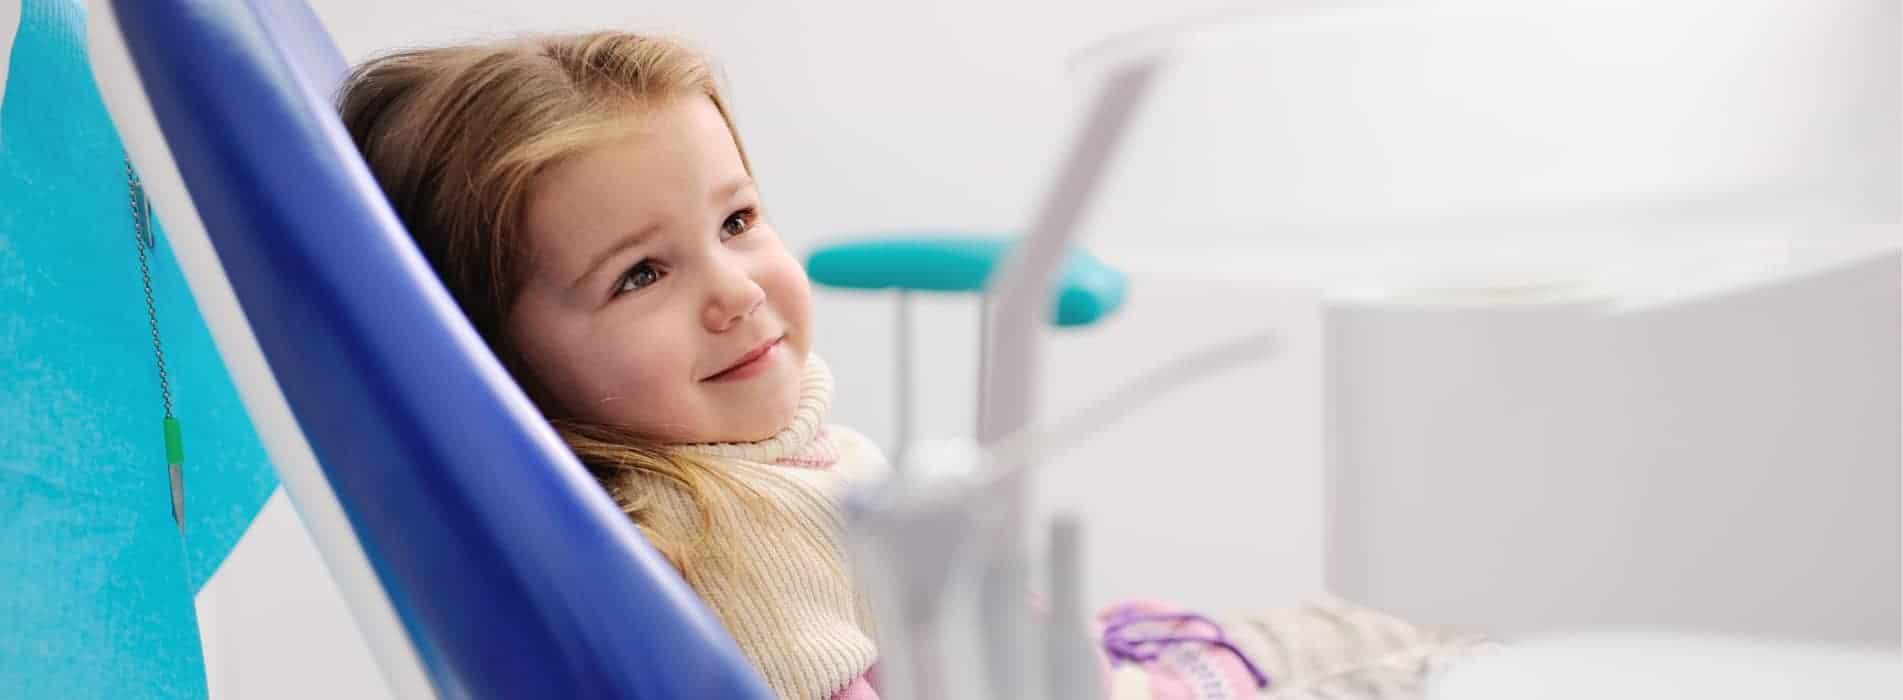 Clinica-dentale-odontoiatria-pedodonzia-pavia-caprioglio-alberto